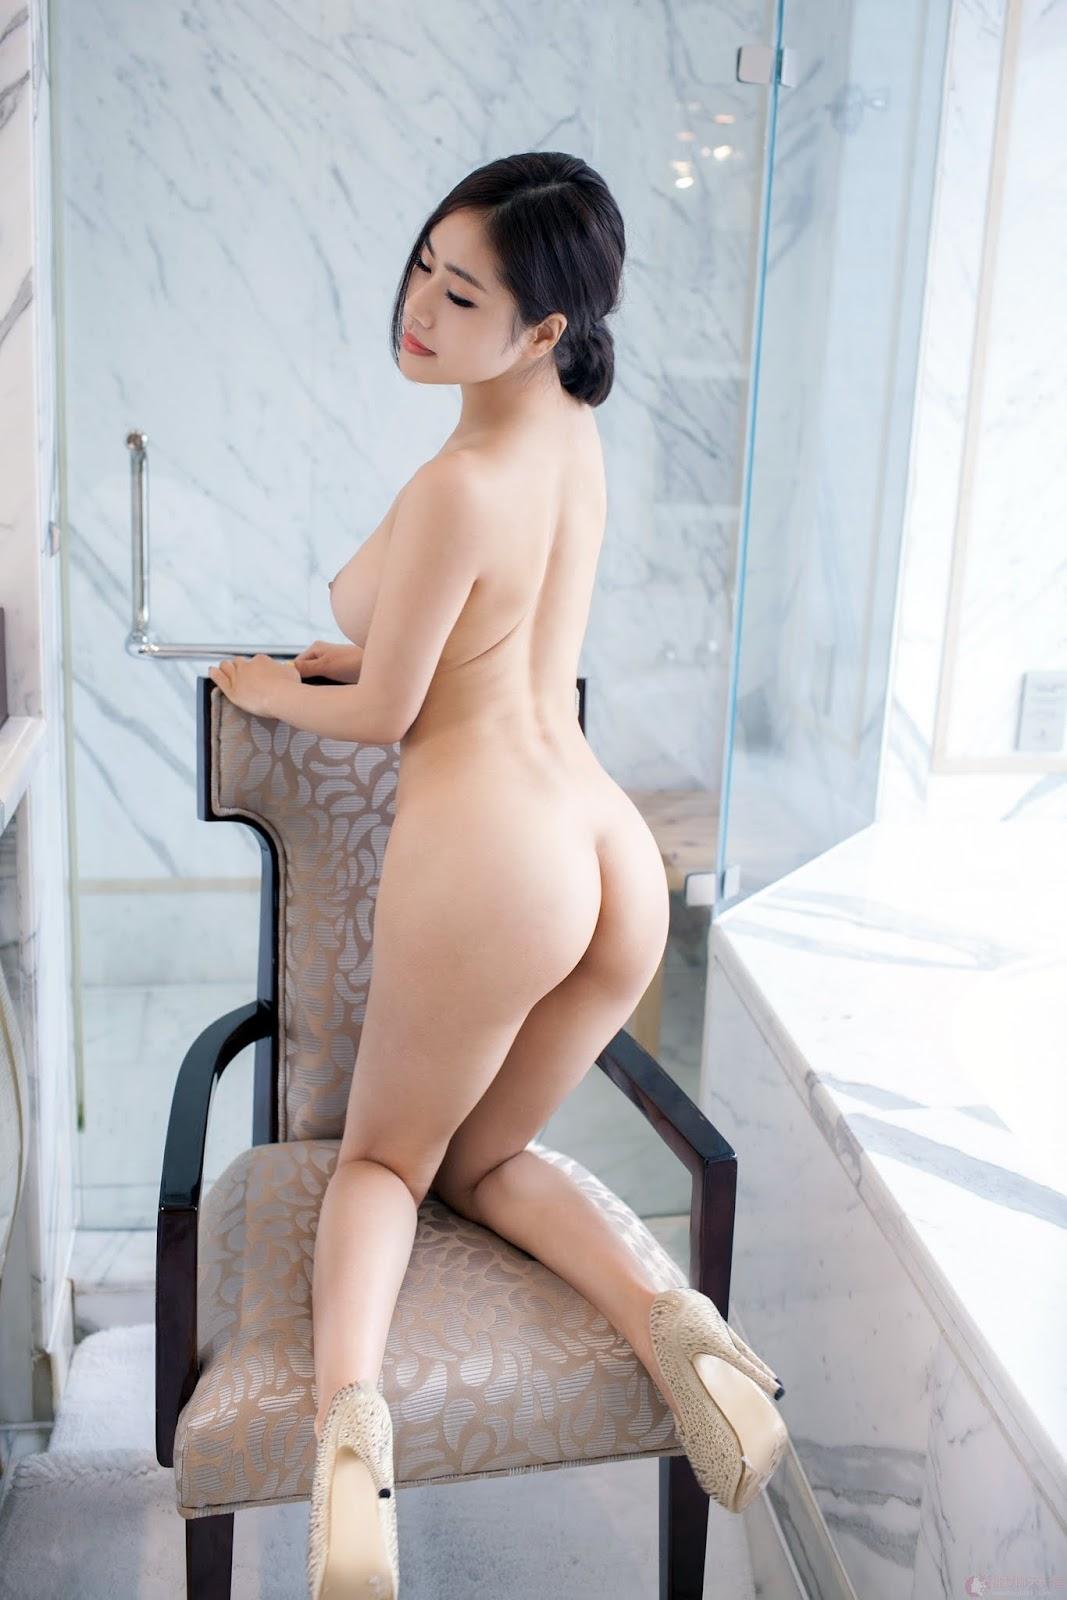 %252B%25C2%25A6%252B%2529%2B%252813%2529 - Hot Girl TUIGIRL NO.53 Sexy